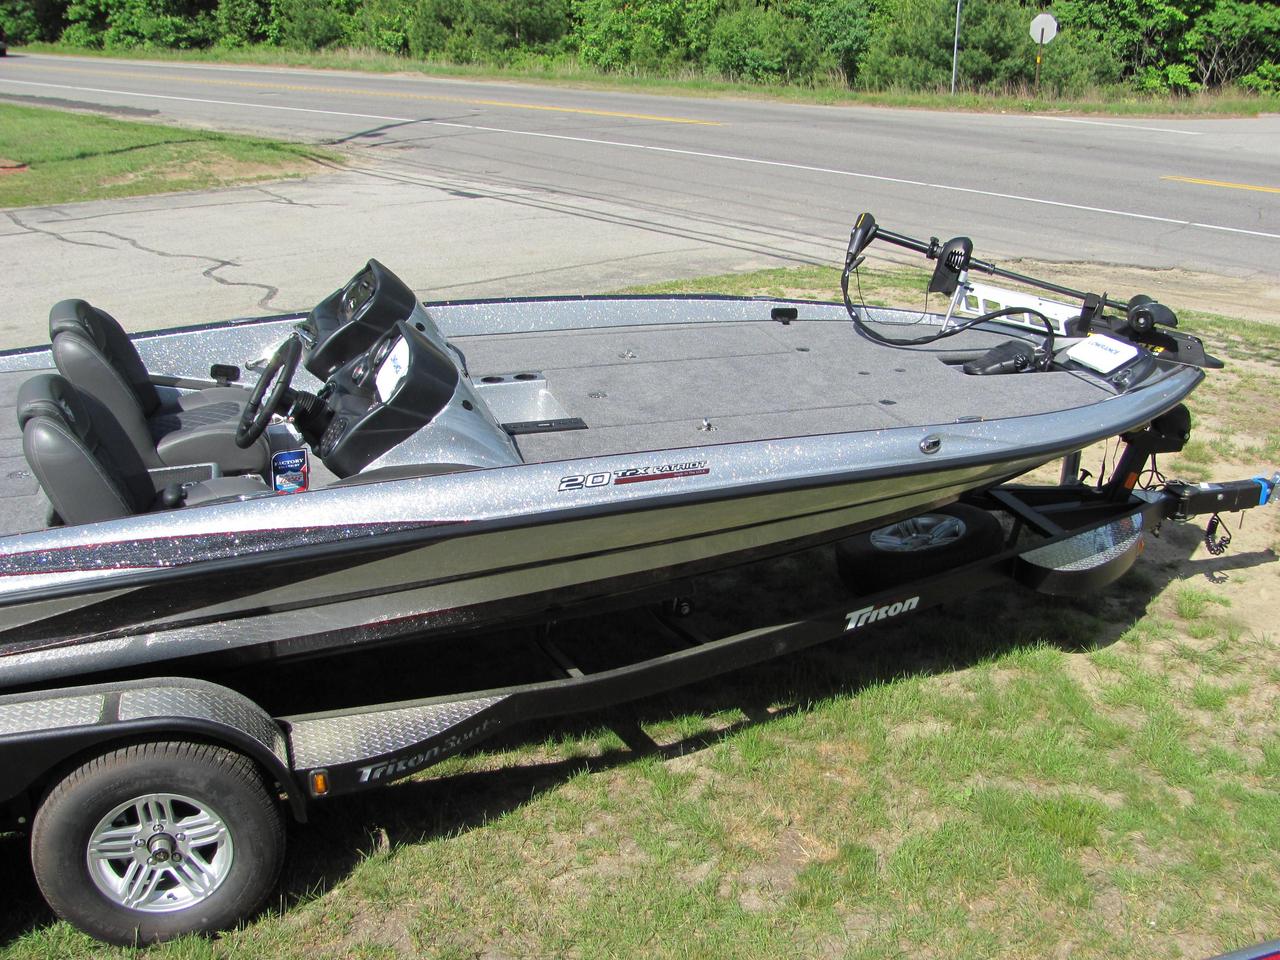 2016 new triton 20 trx patriot freshwater fishing boat for for Freshwater fishing boats